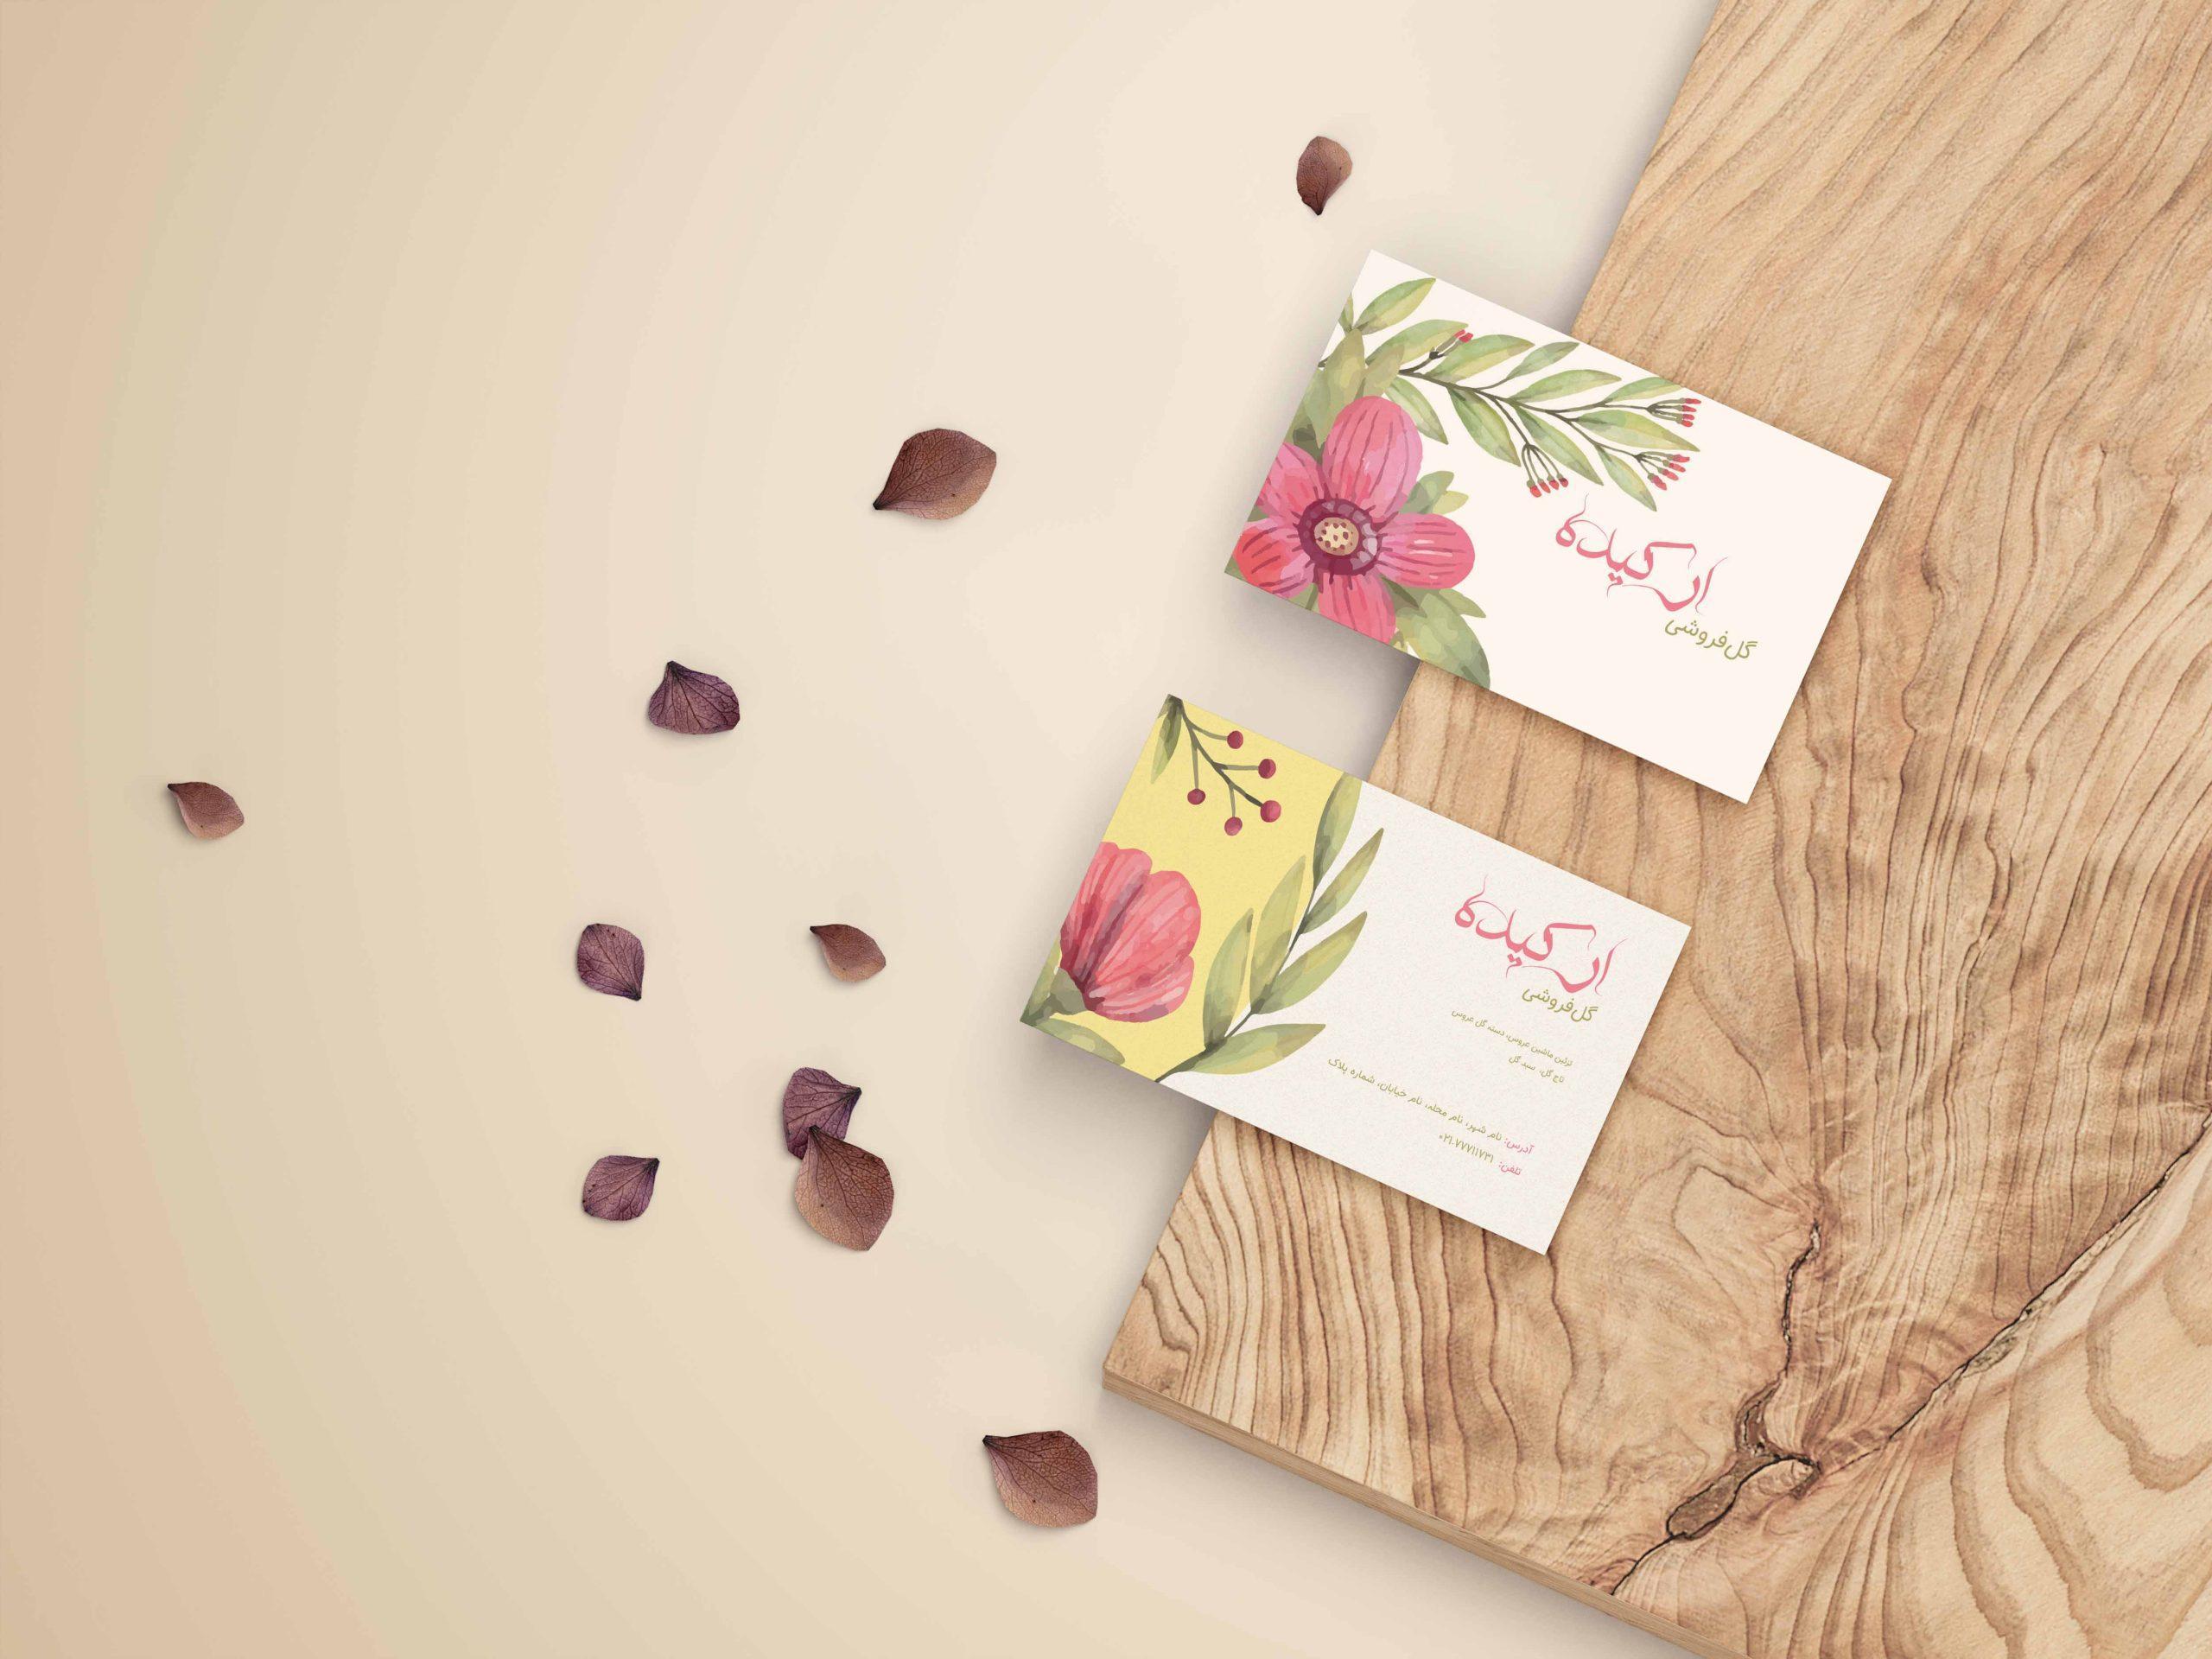 کارت ویزیت گل فروشی ارکیده از ویزیت کارت PSD